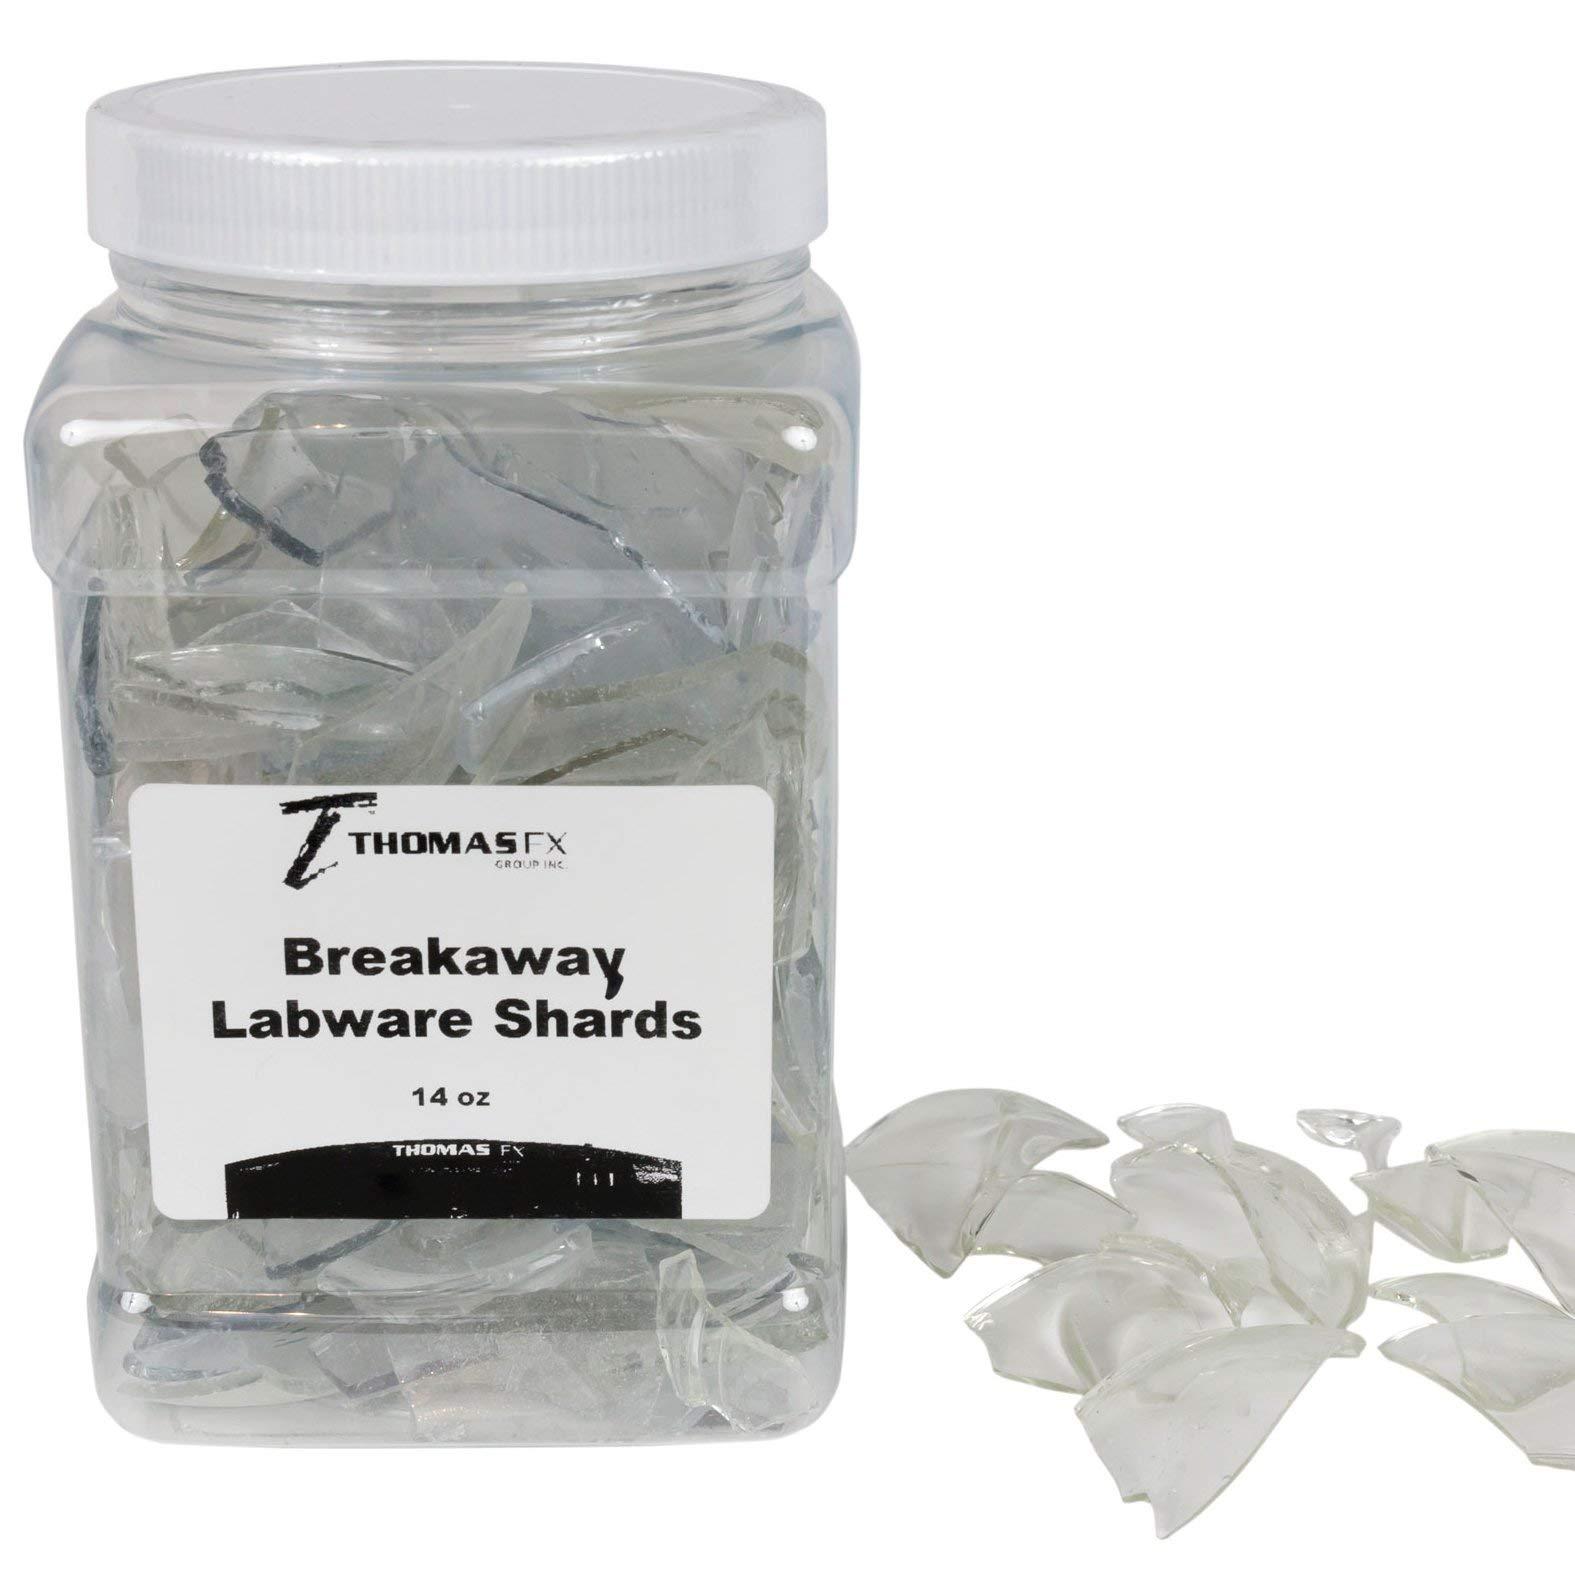 Breakaway Glass Lab-Ware Shards New! Fake Glass Shards by Thomas FX®